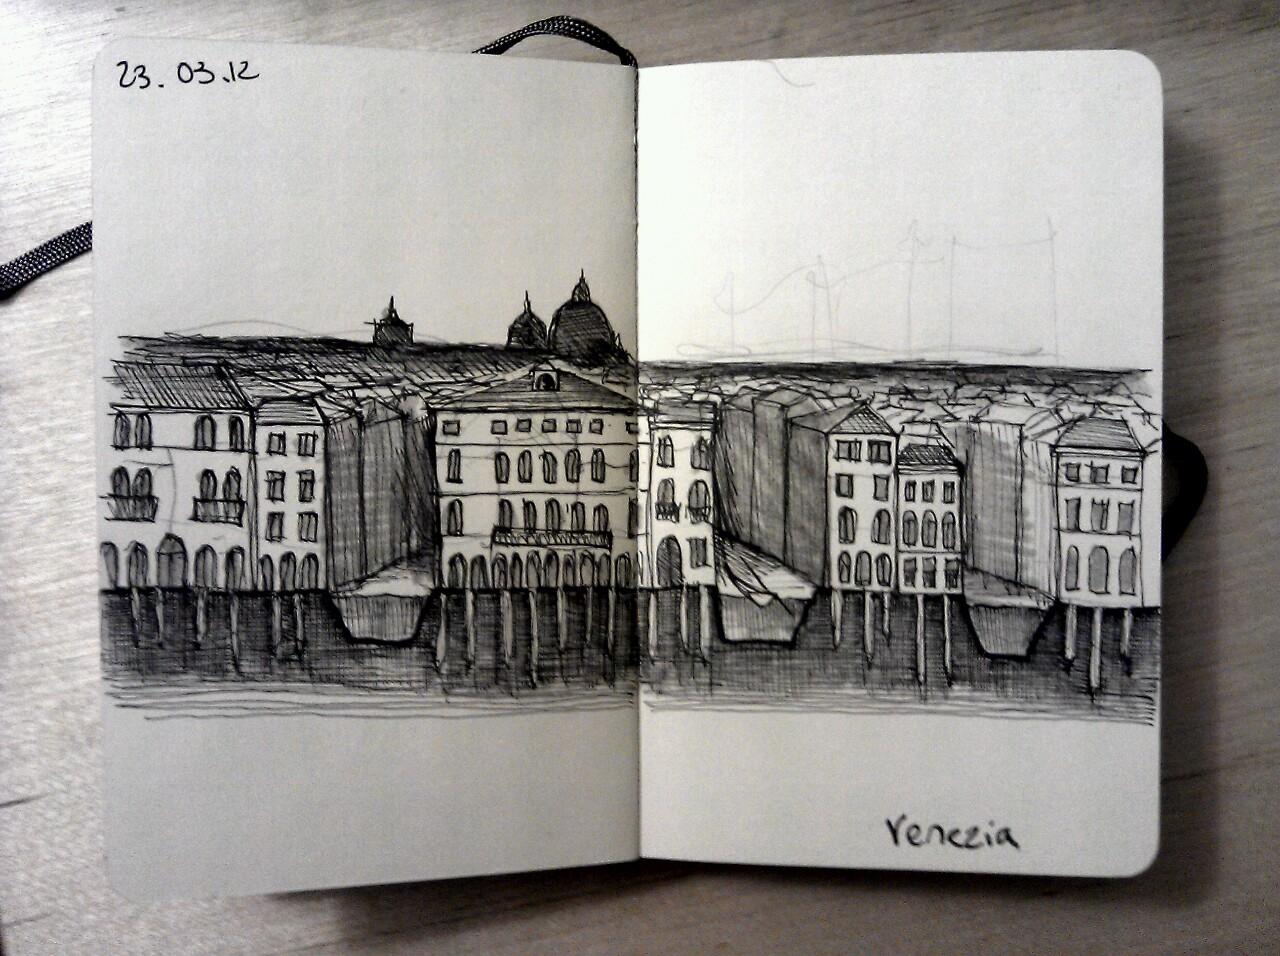 365 drawings later … day 52 … venezia